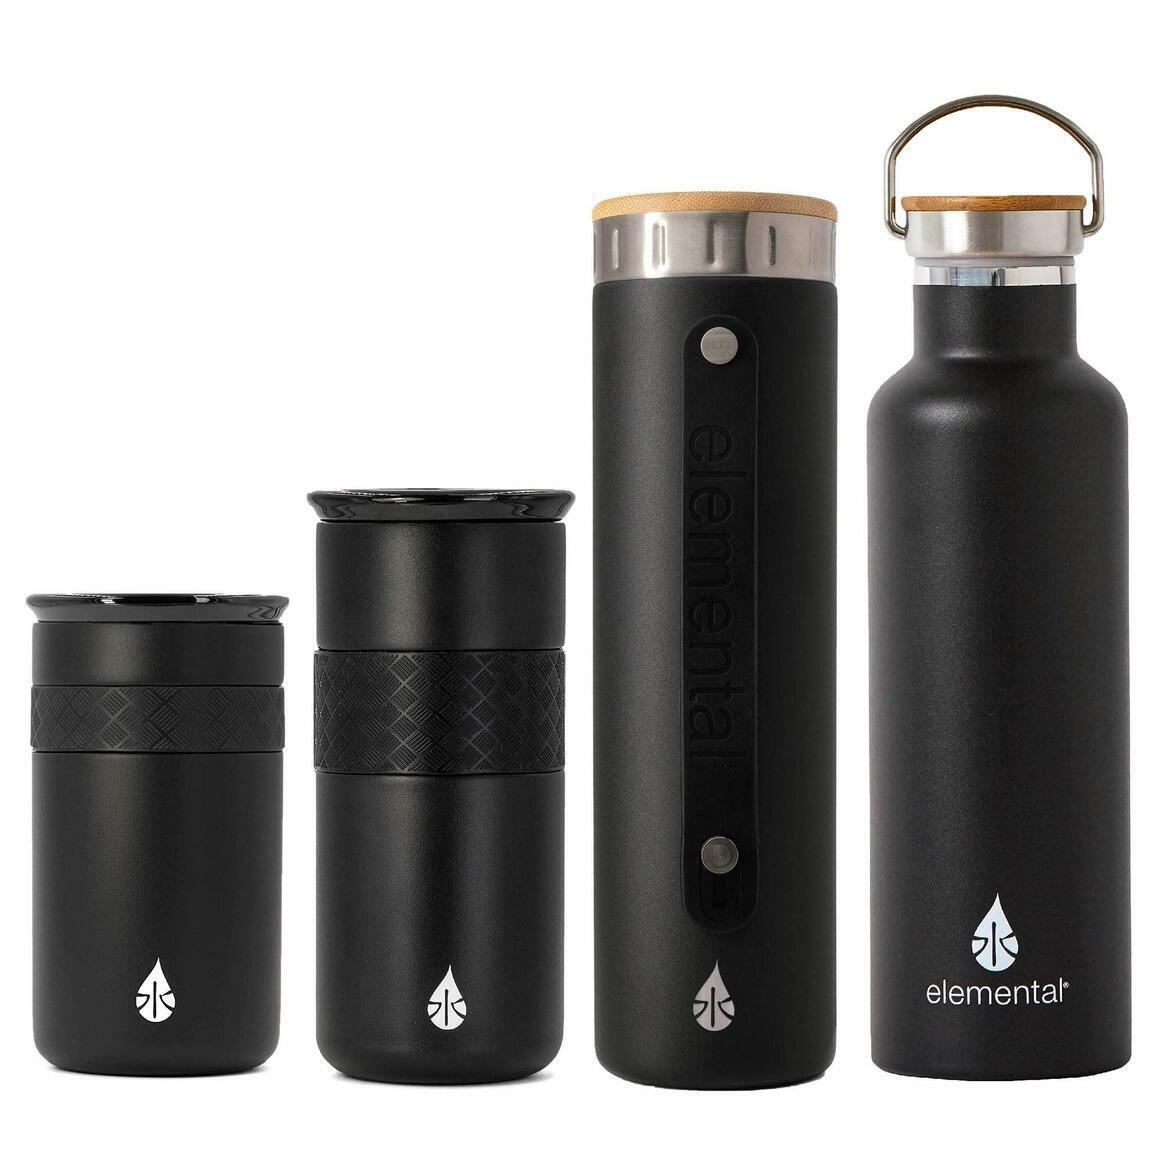 Sample Pack of Elemental Drinkware Products - Matte Black   Trada Marketplace